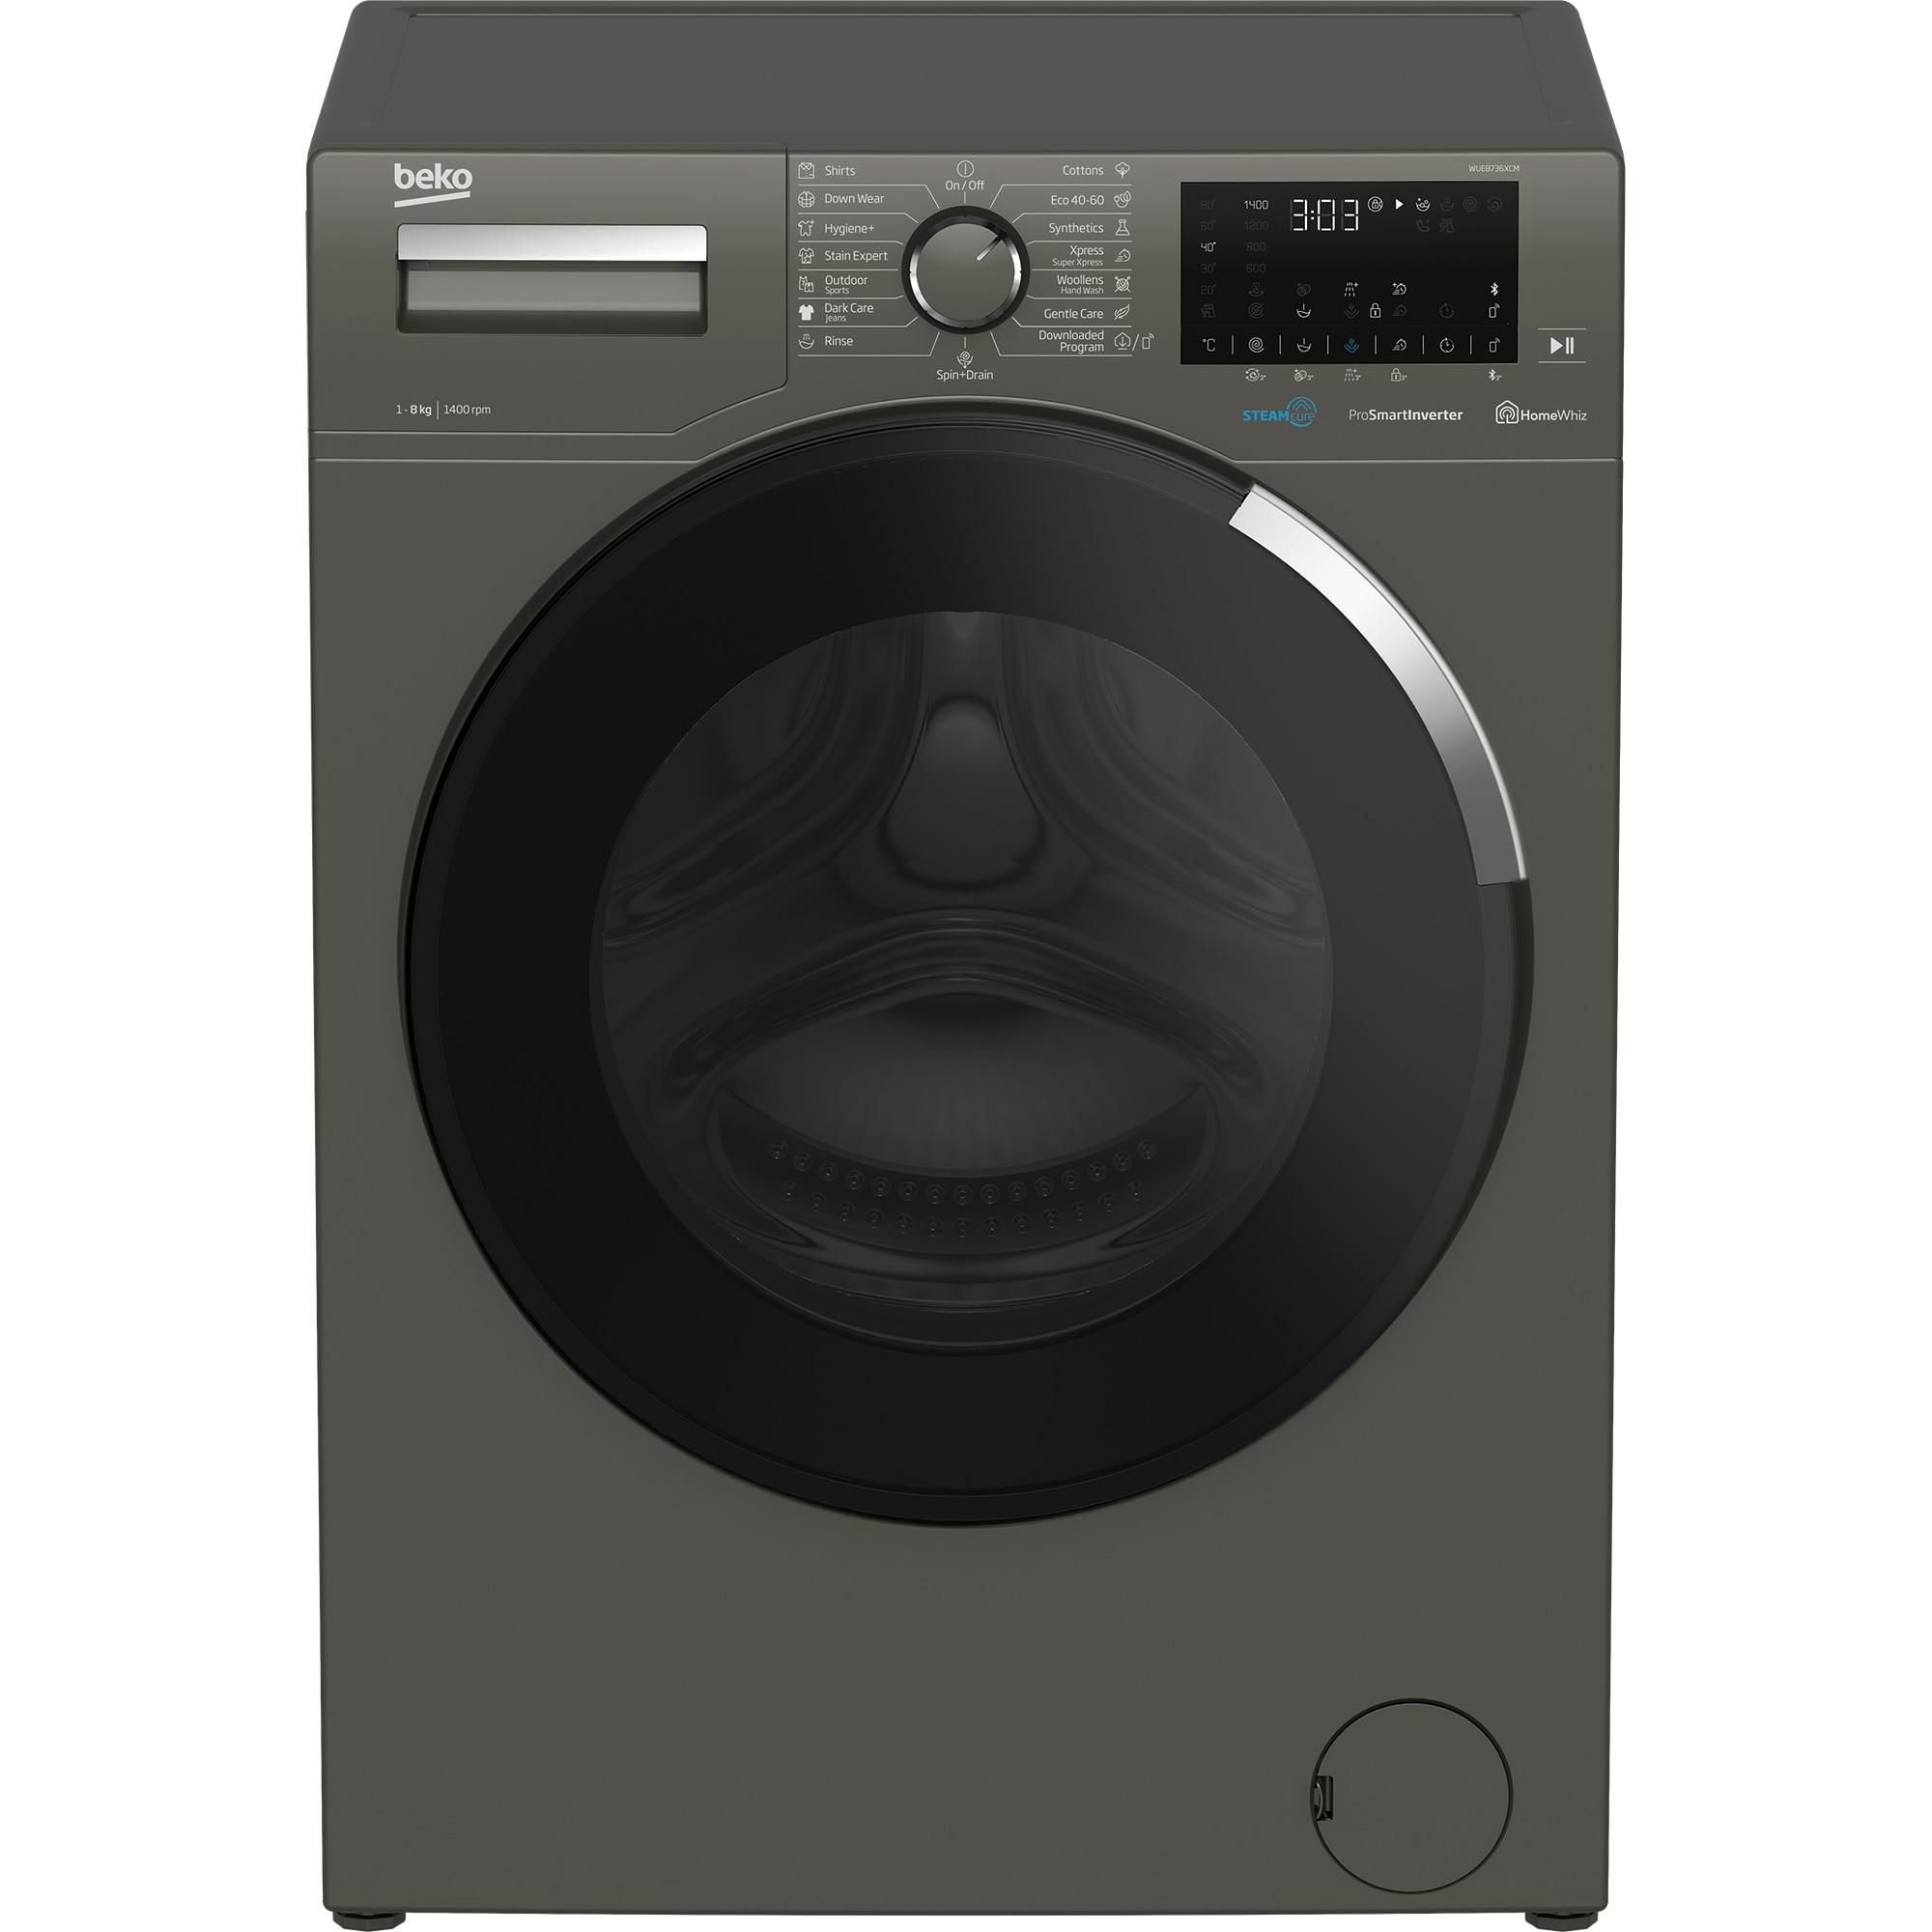 Fotografie Masina de spalat rufe Beko WUE8736XCM, 8 kg, 1400 RPM, Clasa A+++, SteamCure, HomeWhiz, Motor ProSmart Inverter, Bluetooth, Antracit